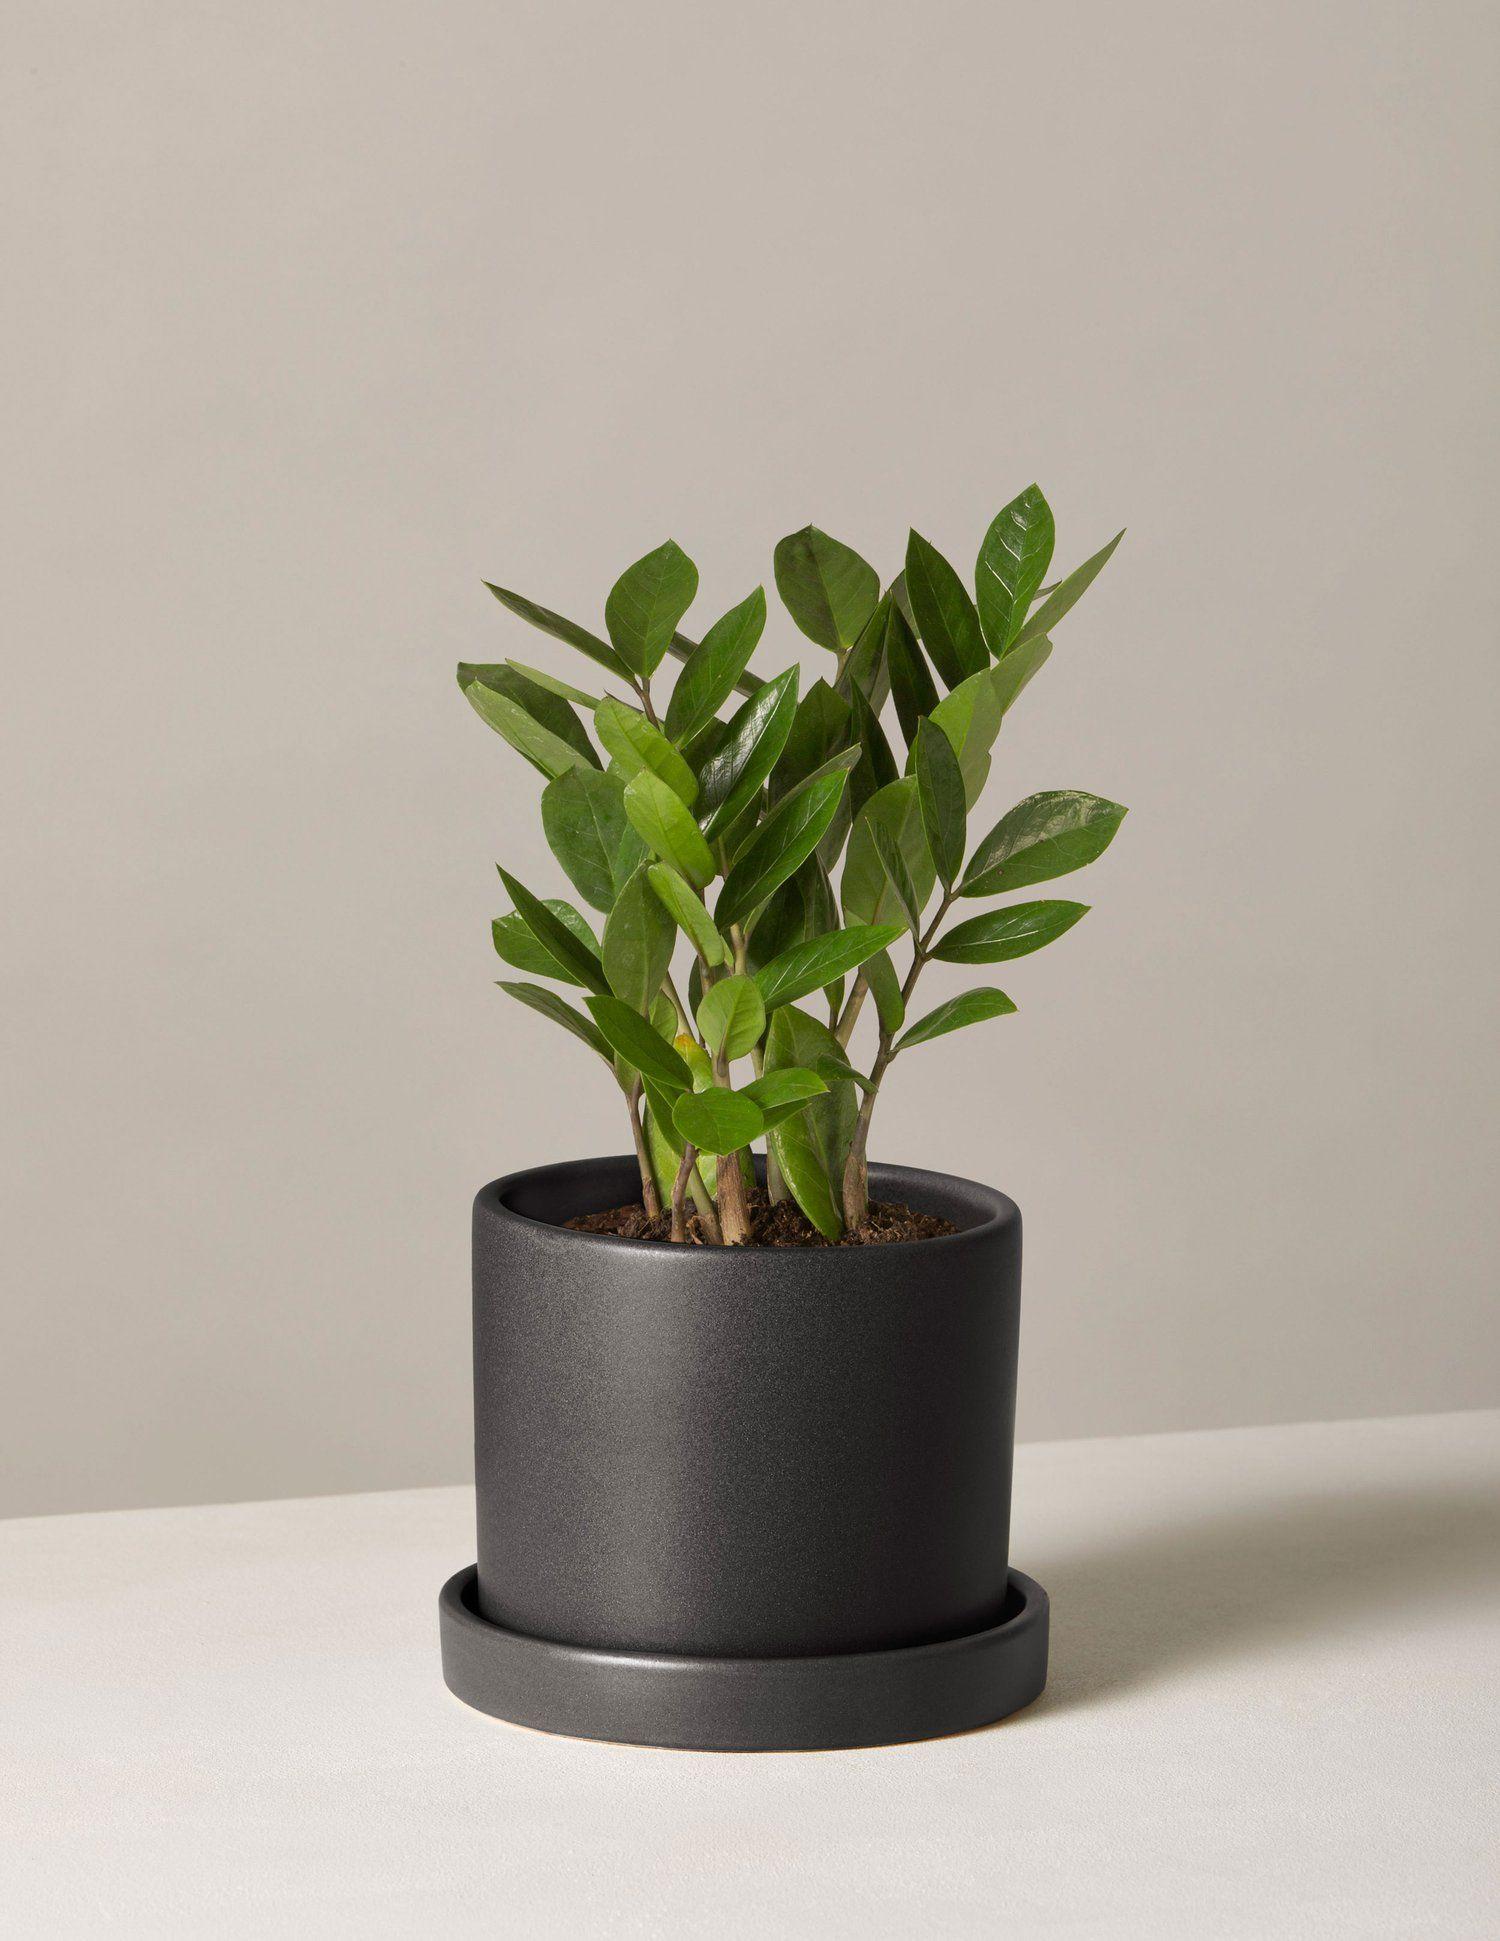 Zz Plant Small Potted Plants Zz Plant Low Light Plants